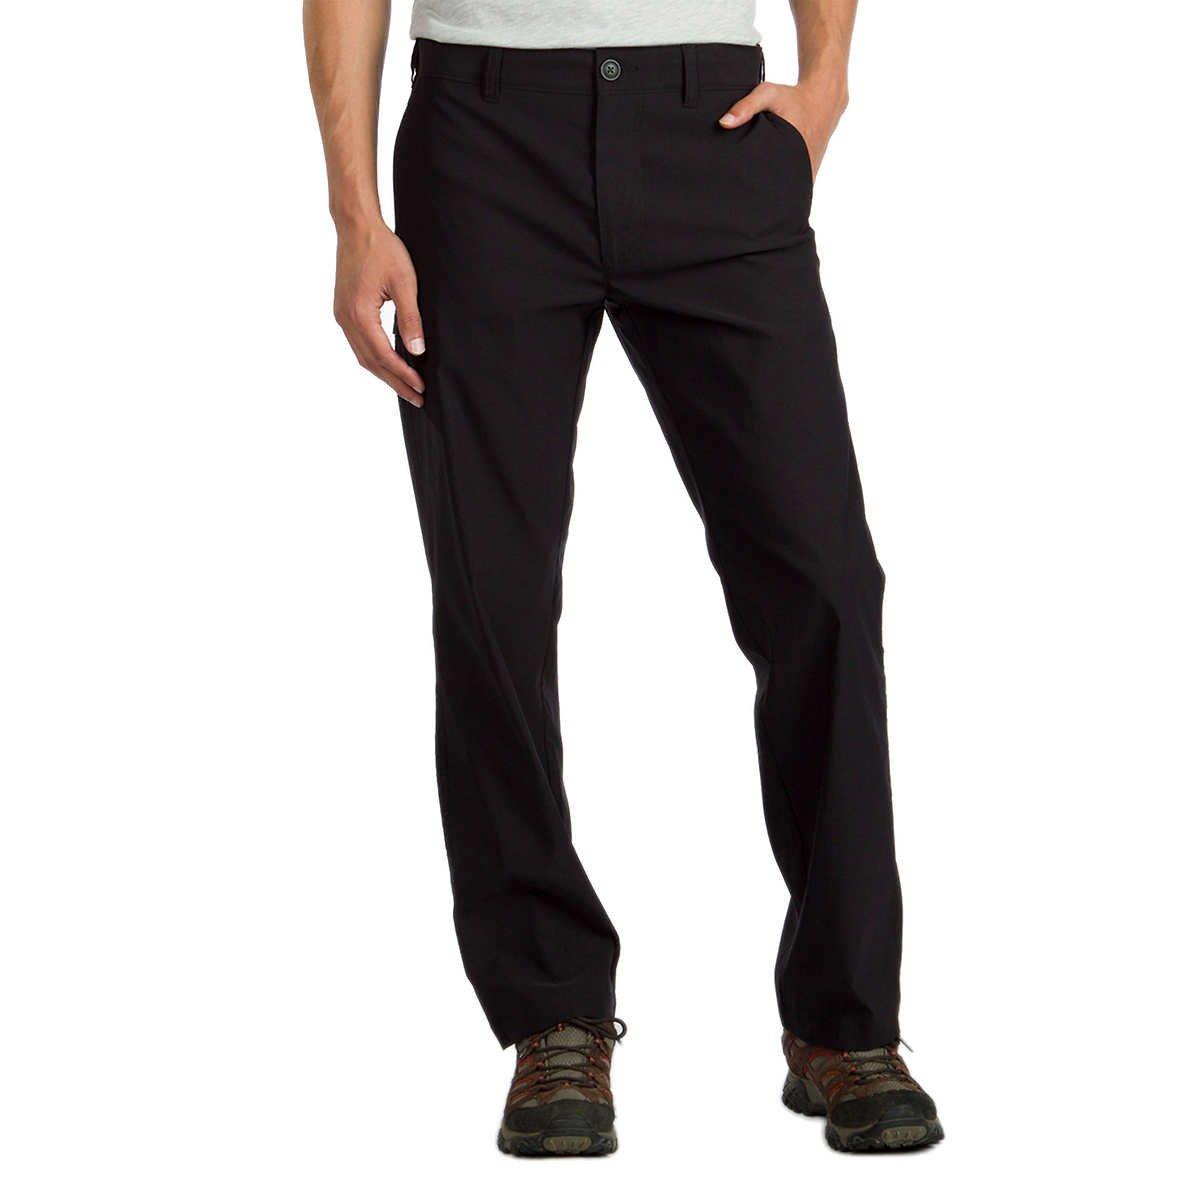 UB Tech by Union Bay Men's Classic Fit Comfort Waist Chino Pants (34 x 30, Black)